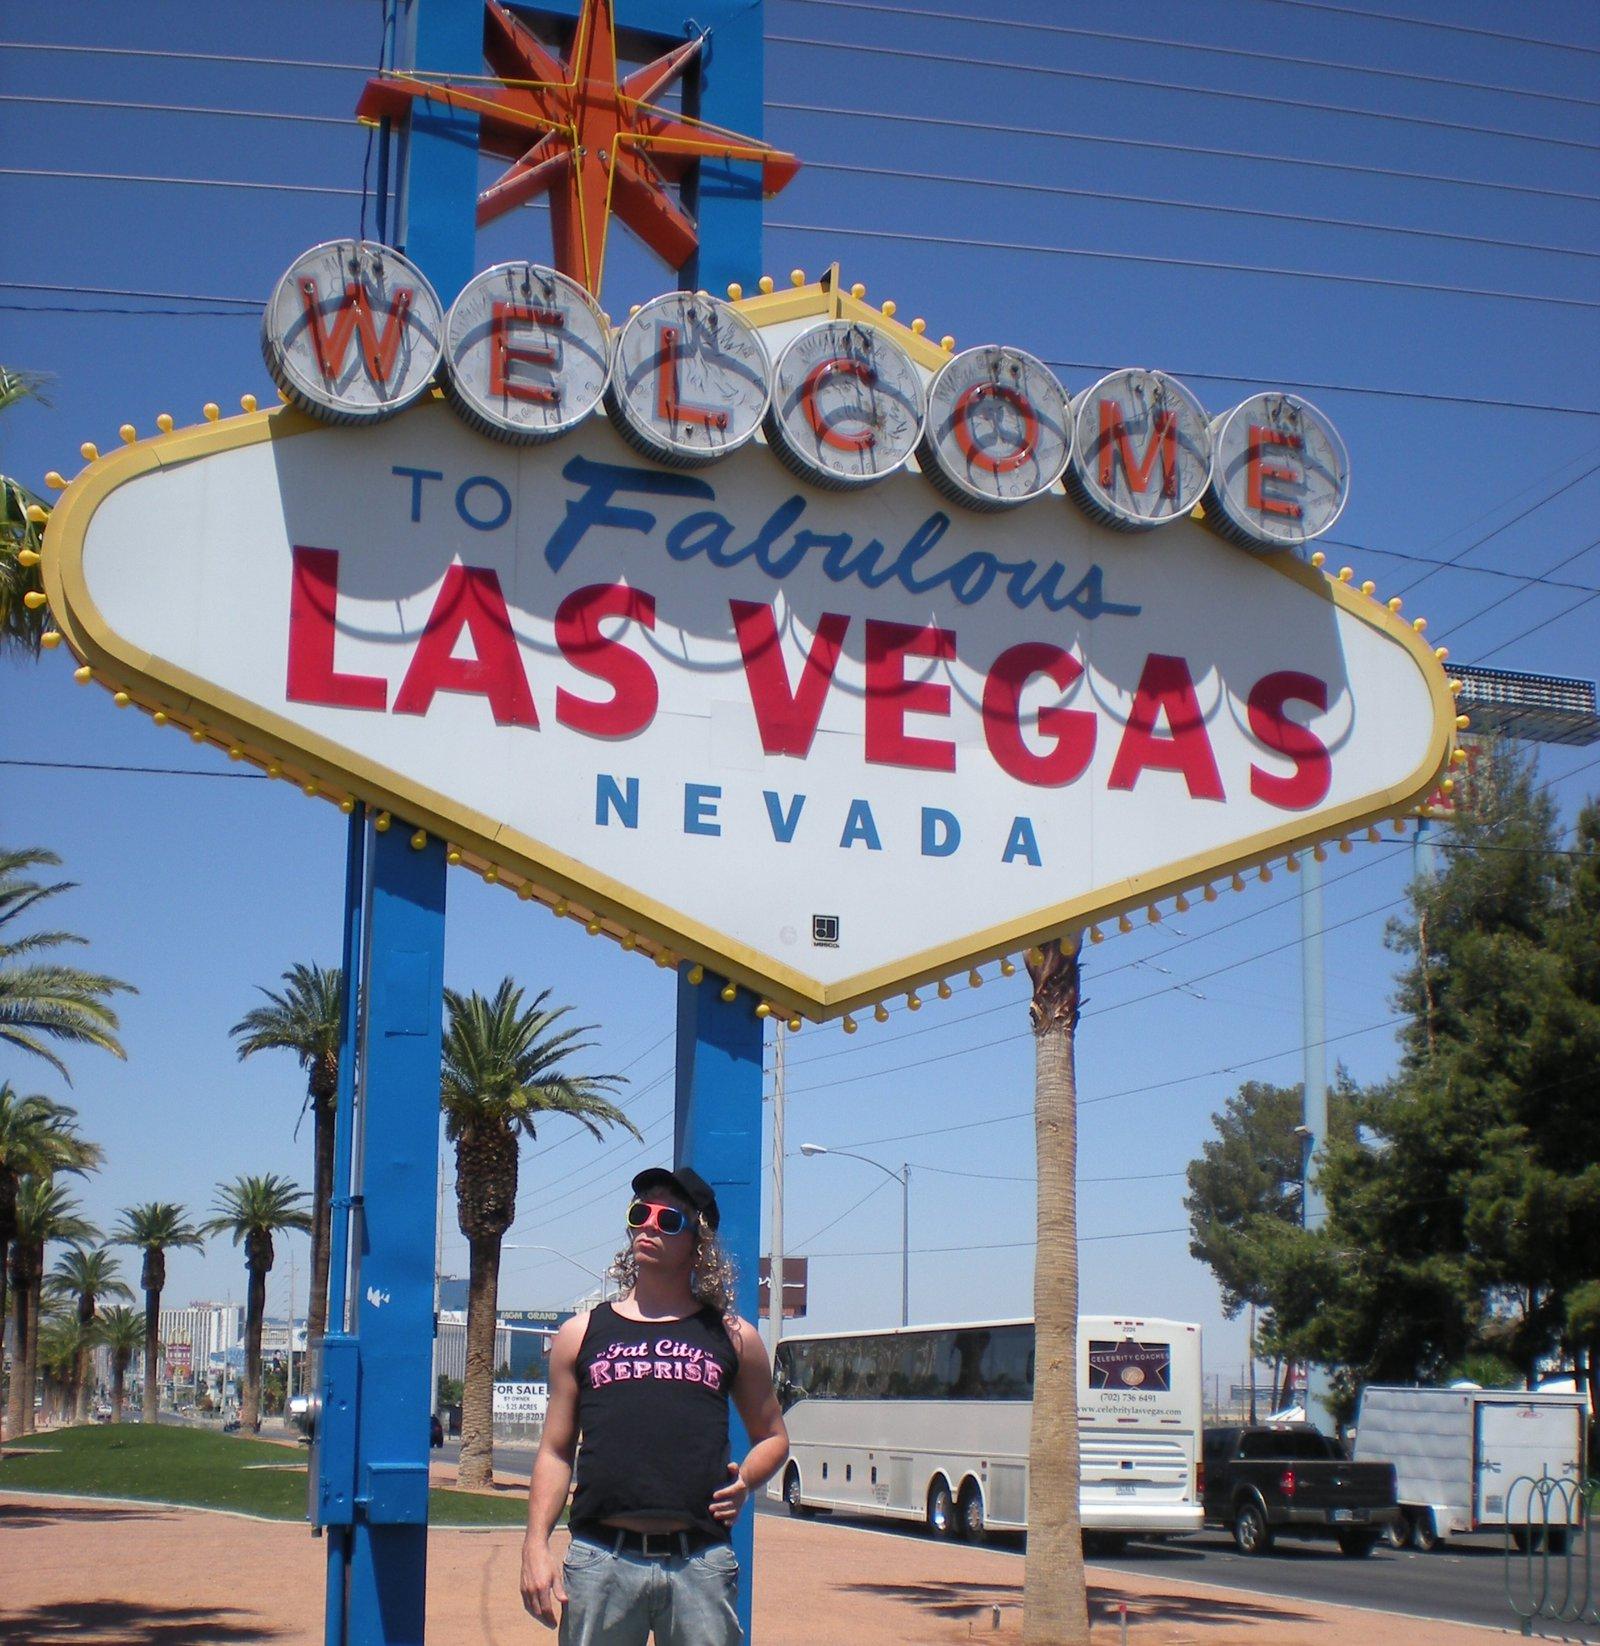 Fat City Reprise in Vegas